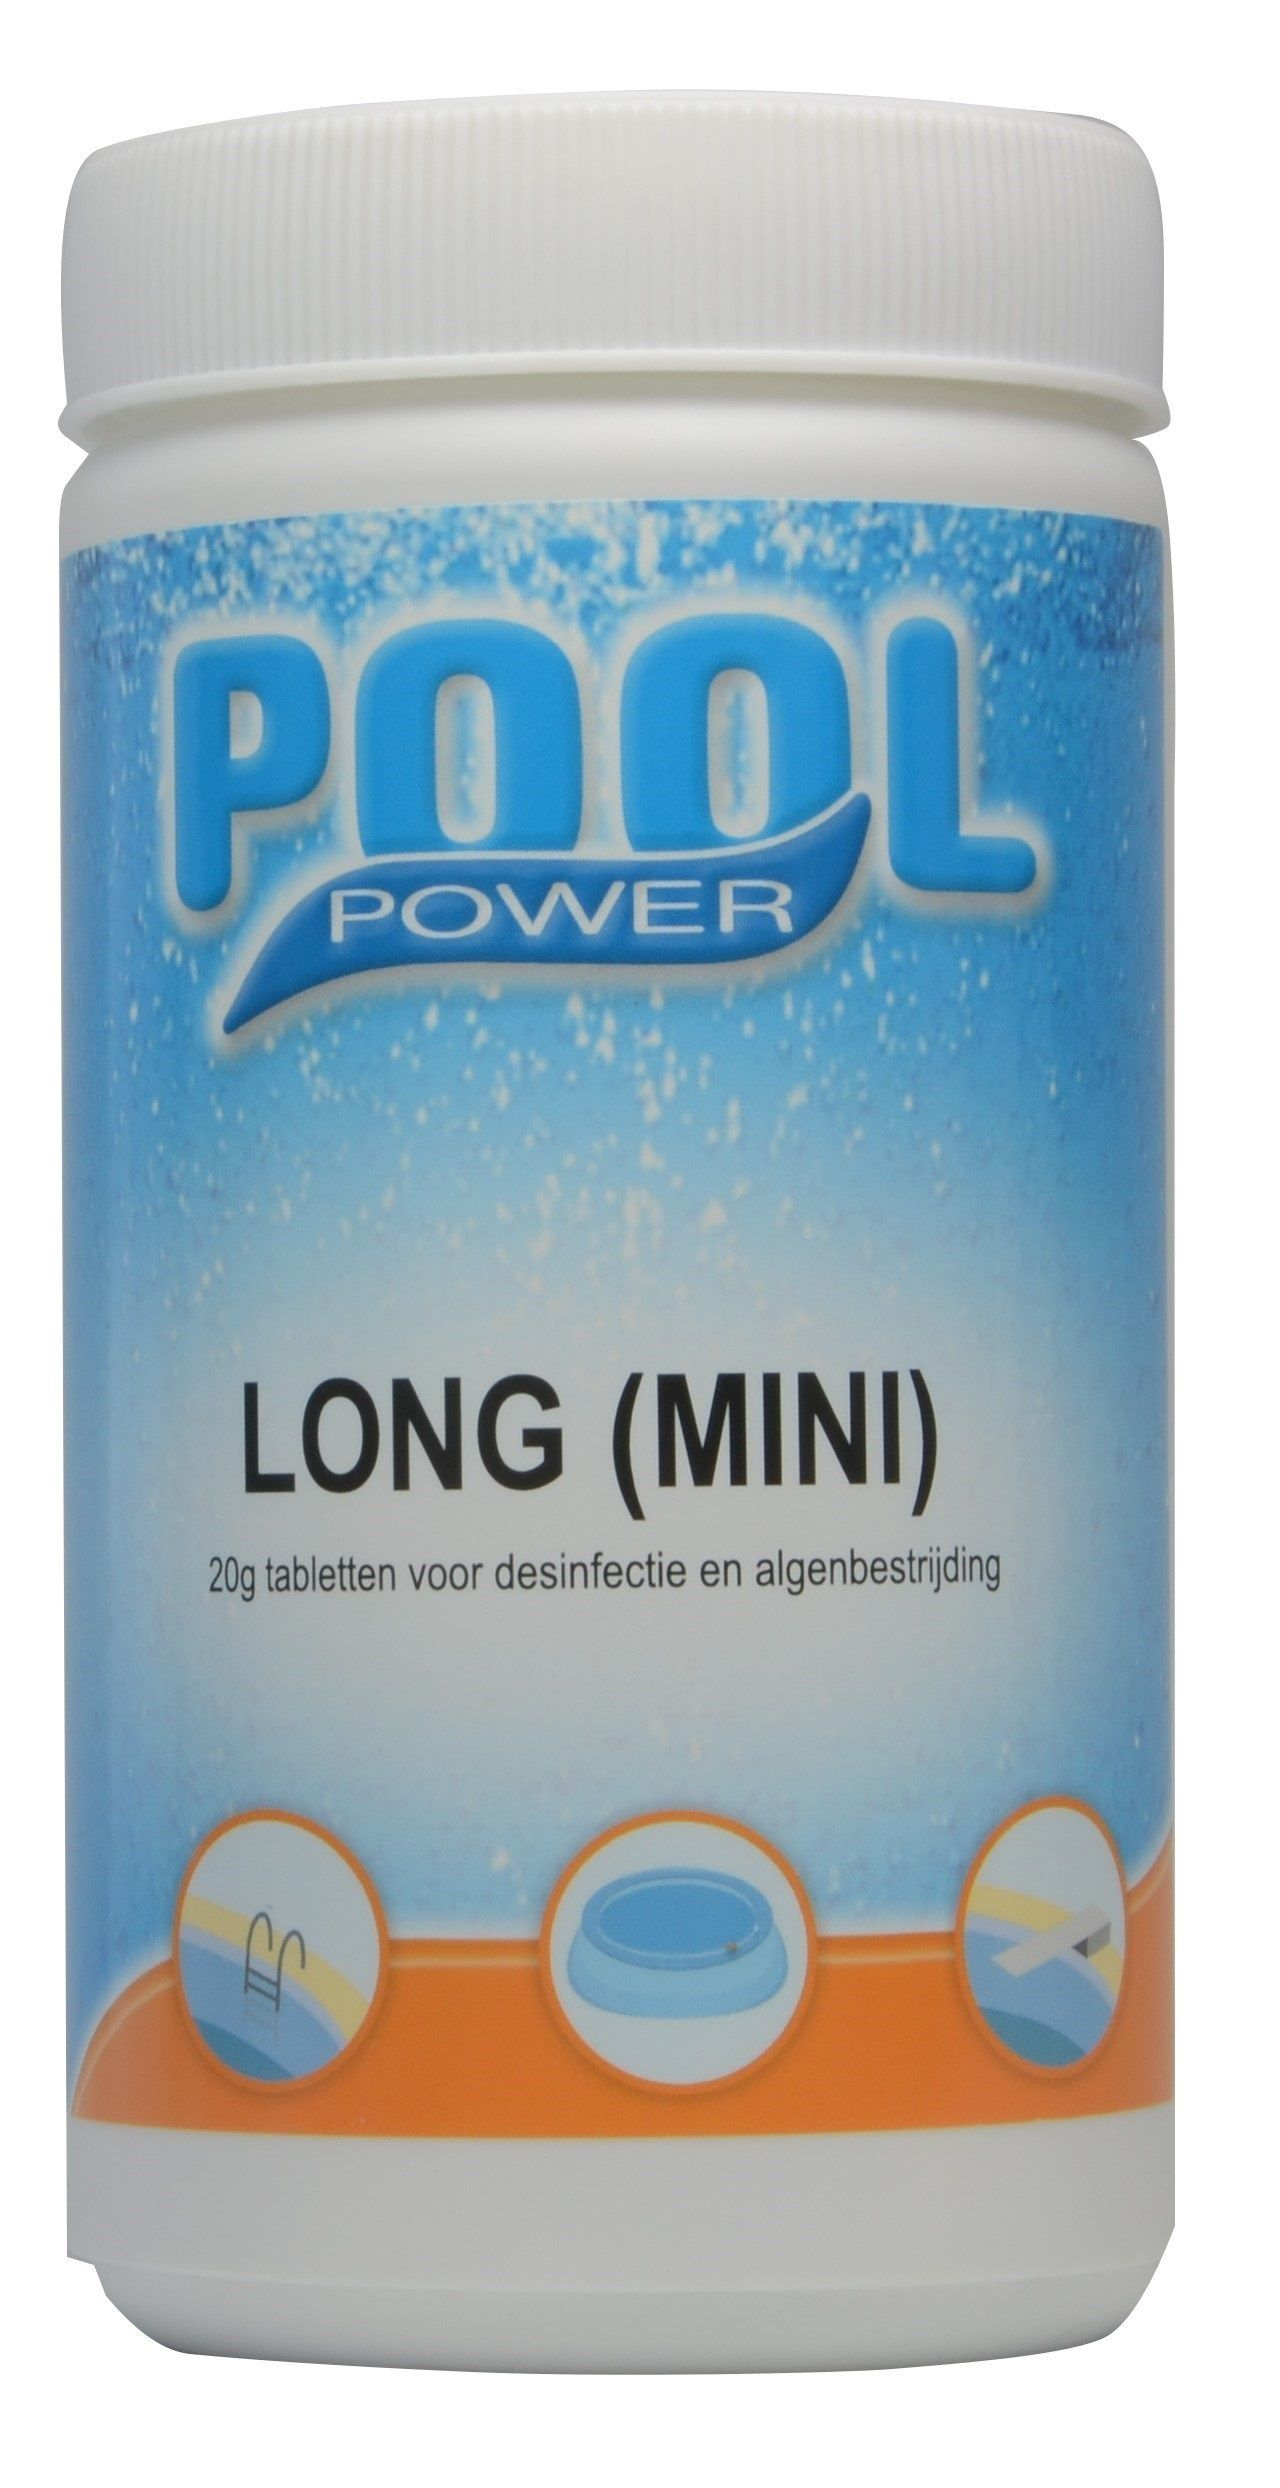 Pool Power long mini zwembad chloortabletten 1kg